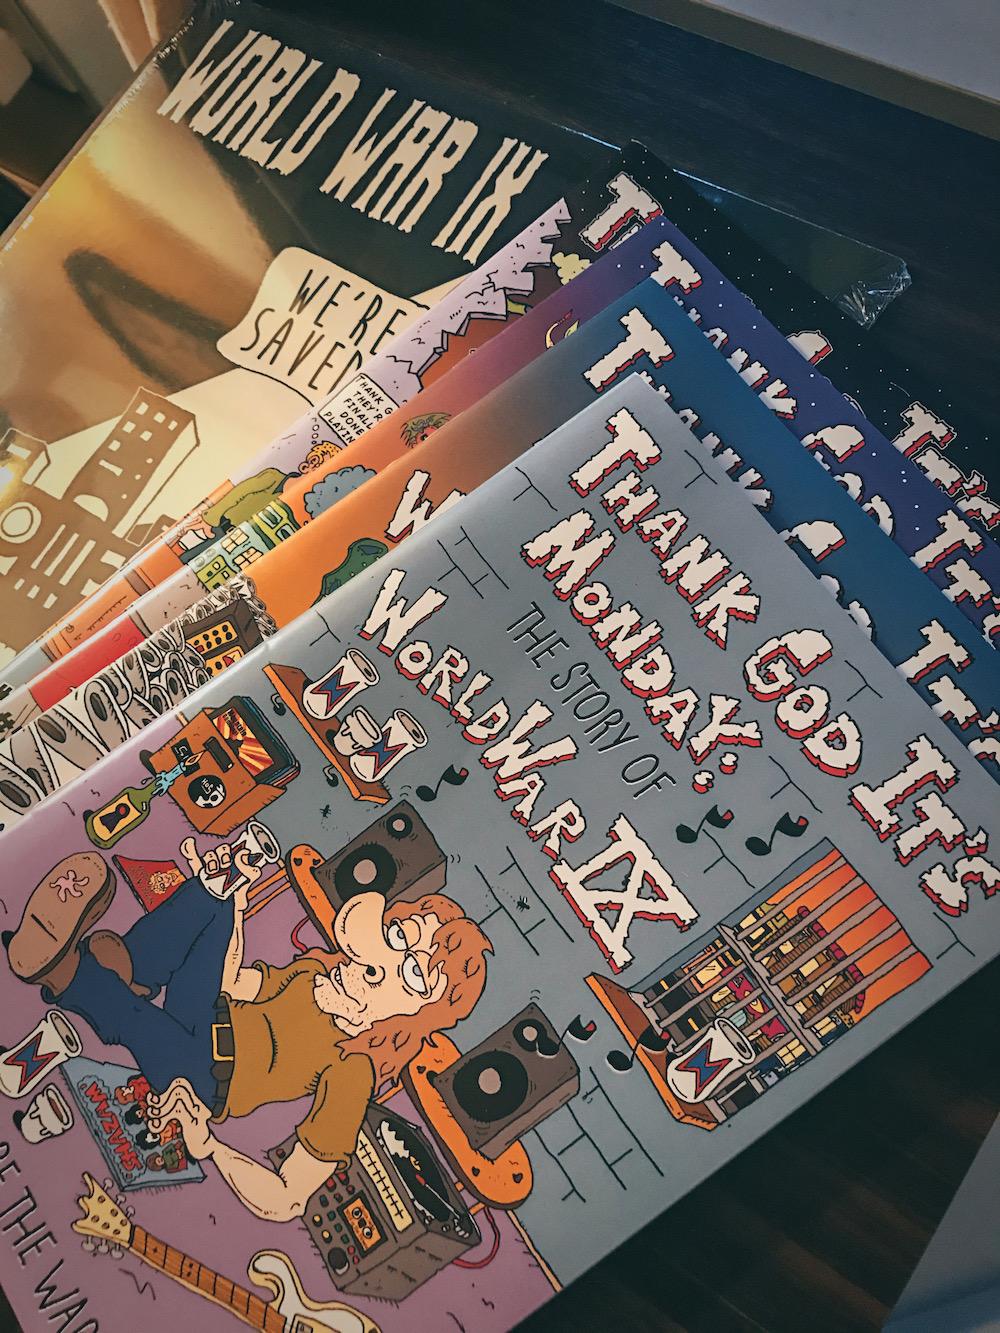 World War IX, Selective Memory, comic books, punk, vinyl